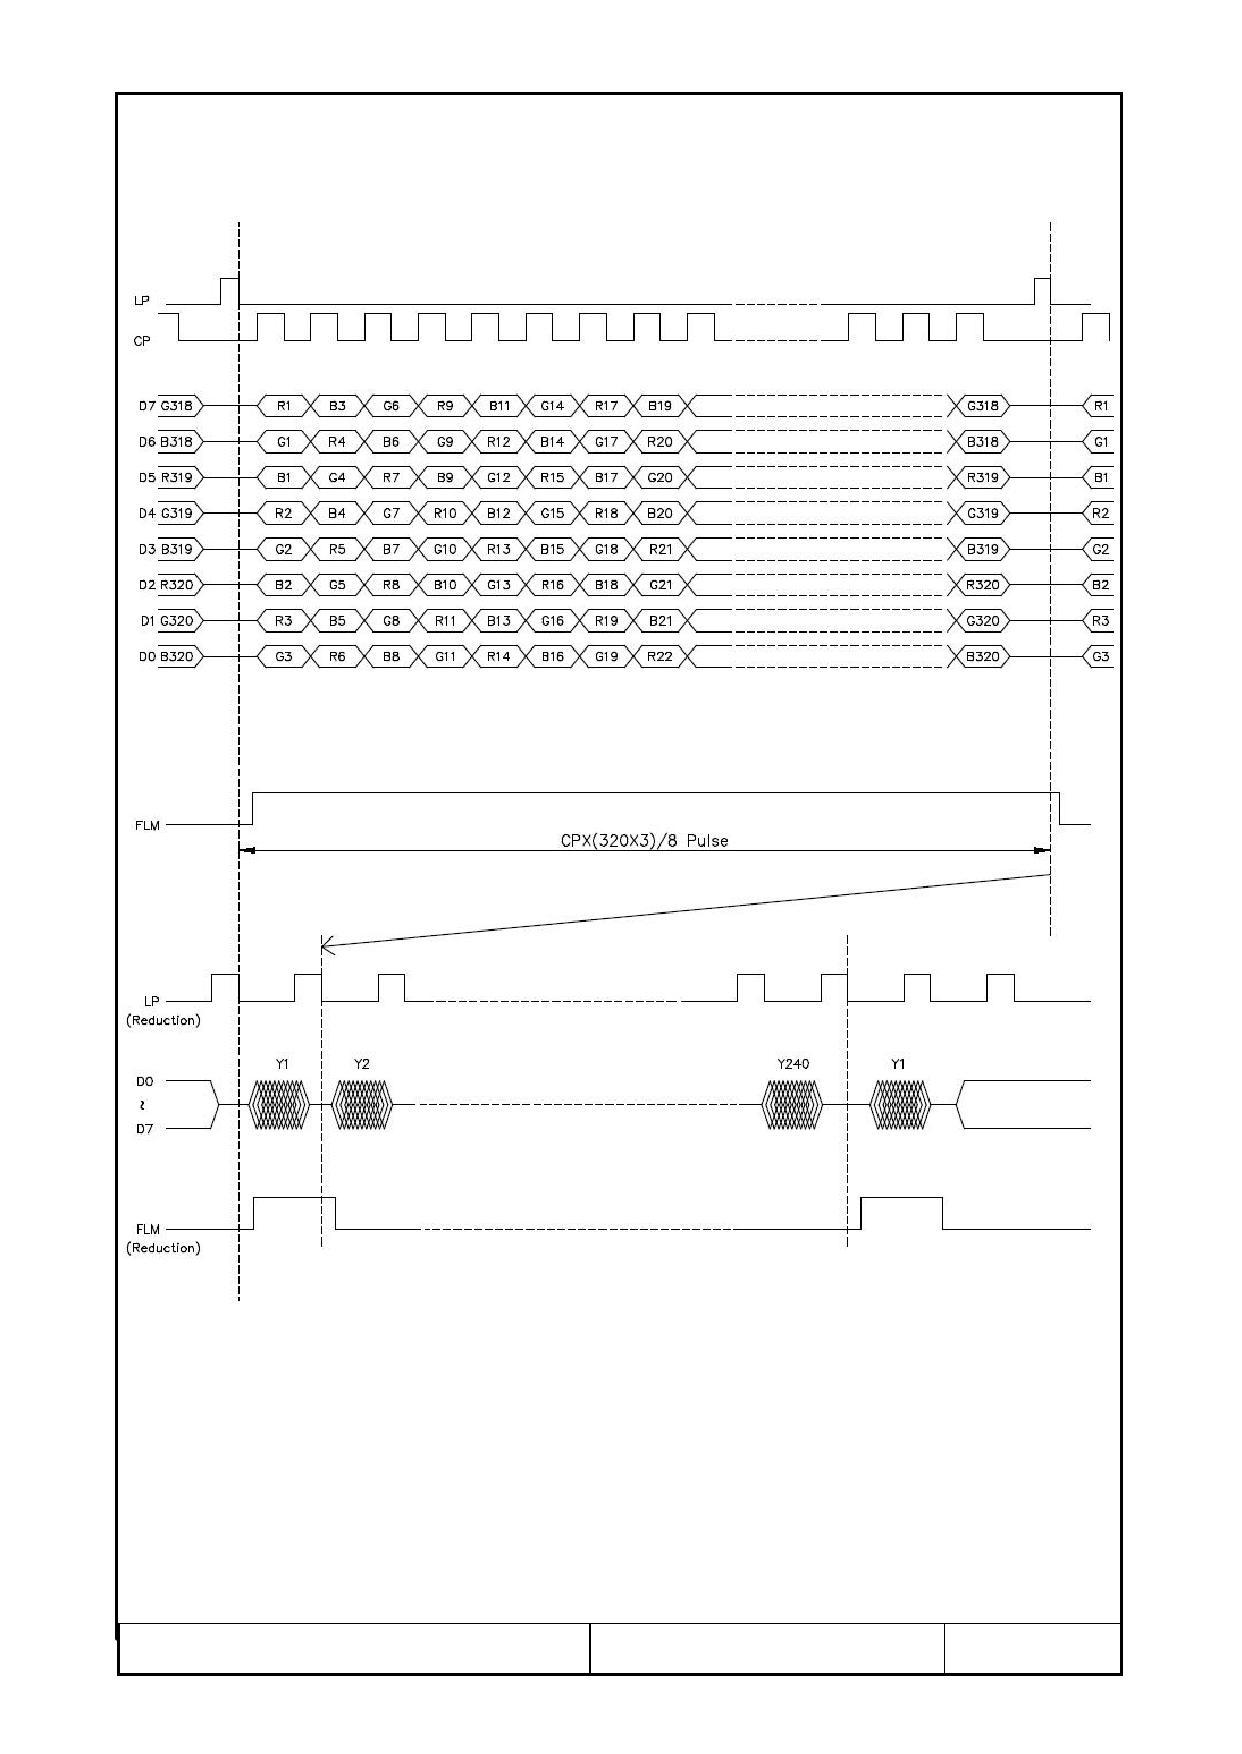 F-51900NCU-FW-AD pdf